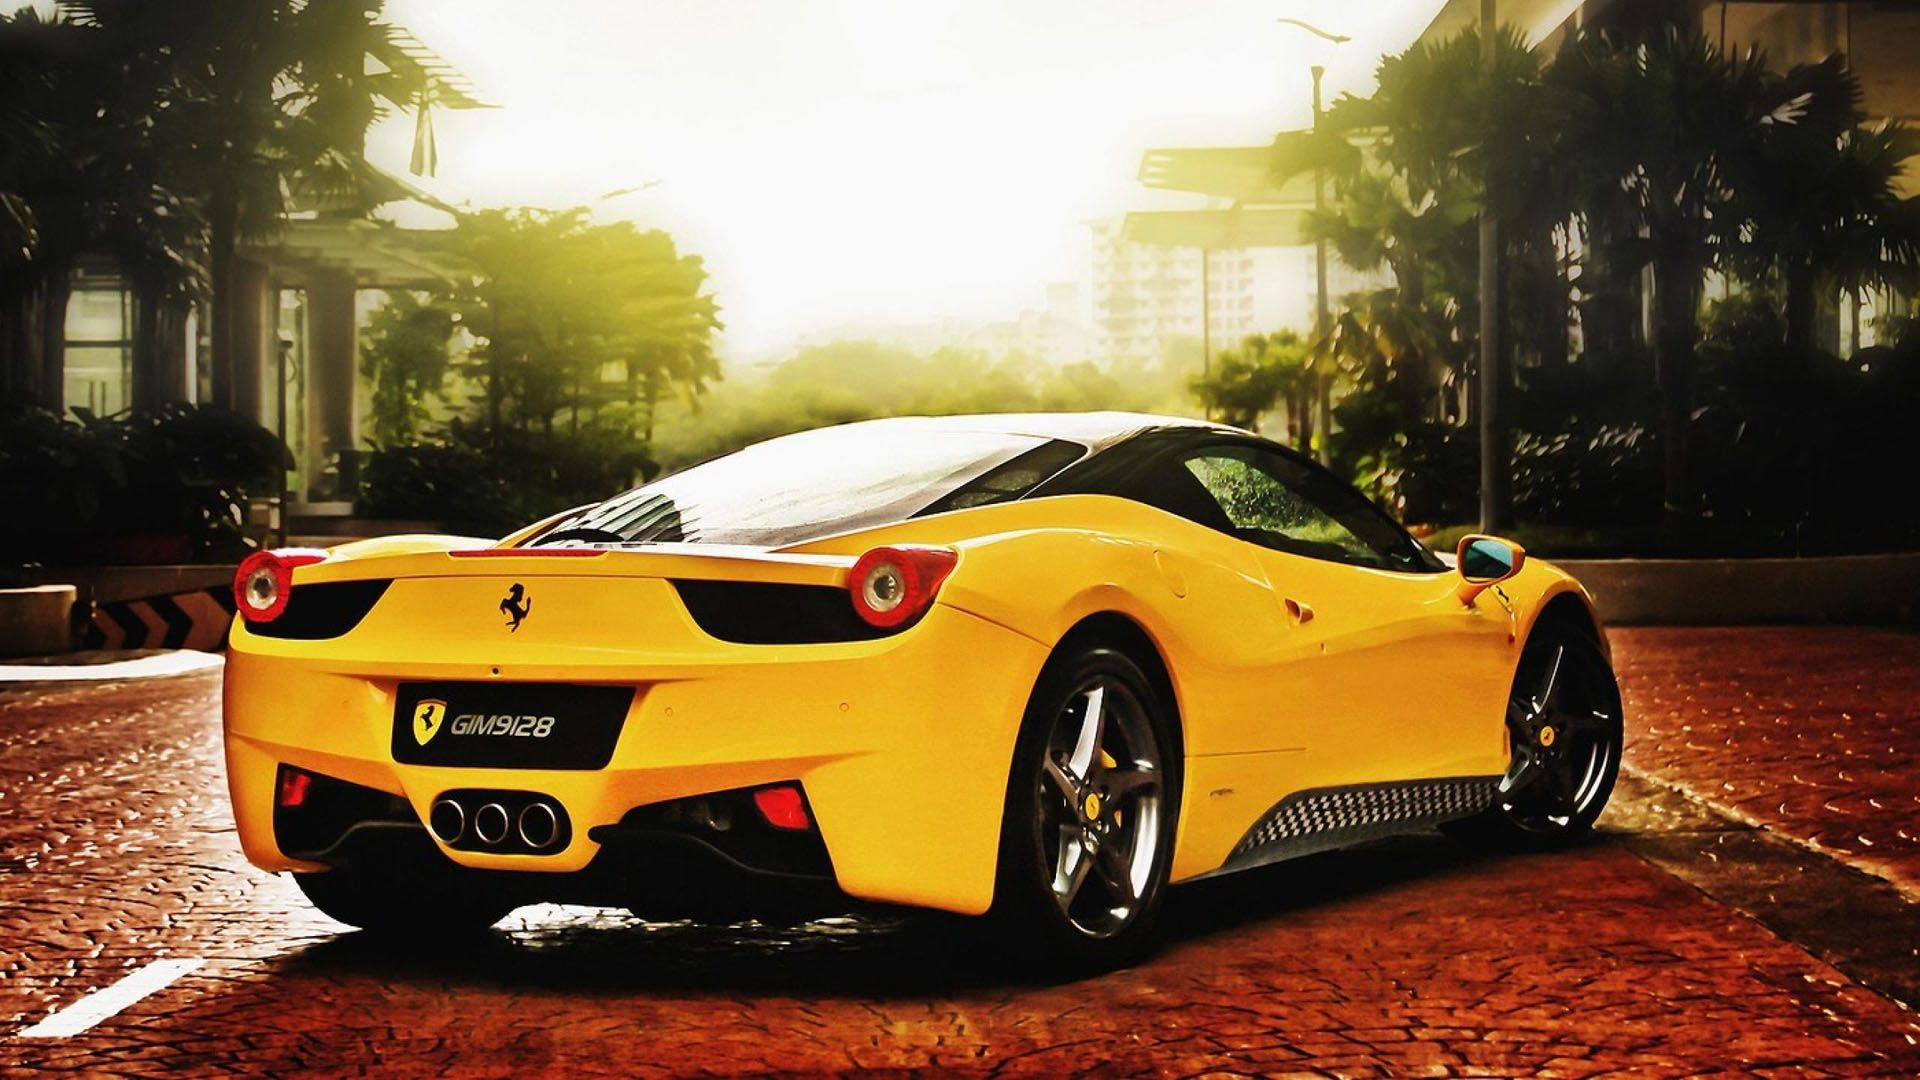 Yellow Ferrari Car HD Wallpaper | Top Wallpapers